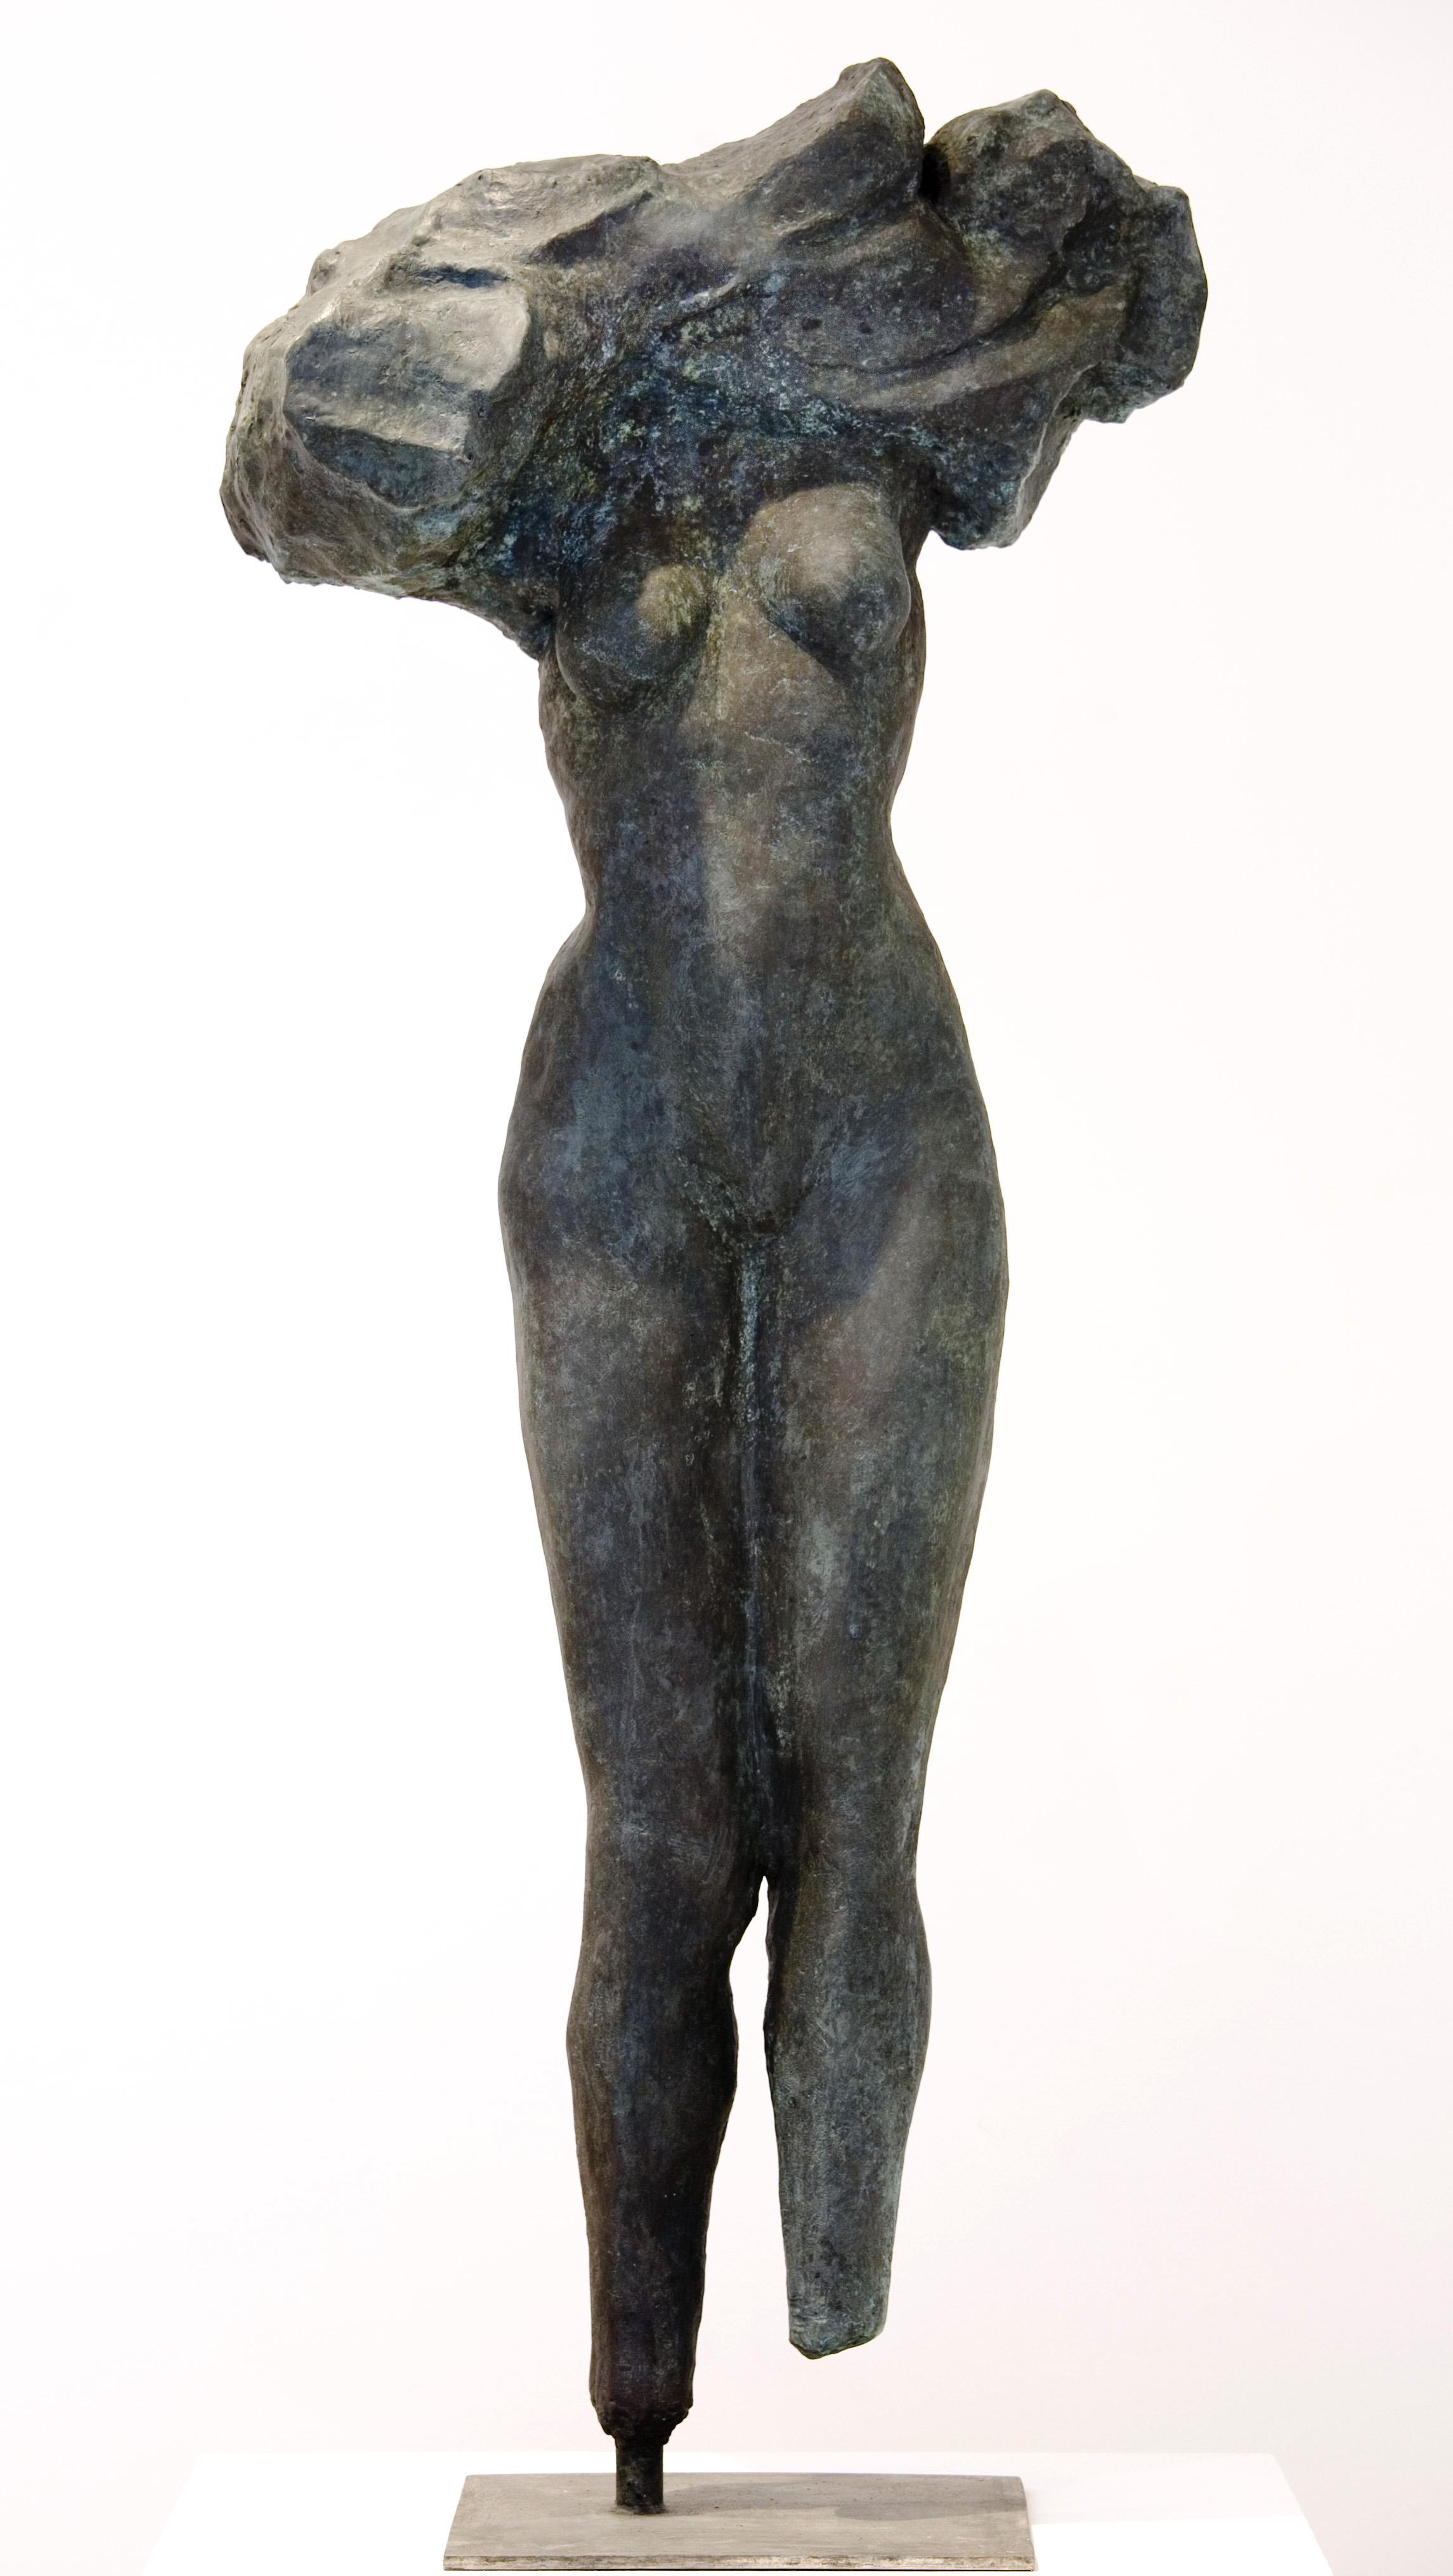 grâce bronze  175x095x0.26 cm coll. J Schaling Bougogne France